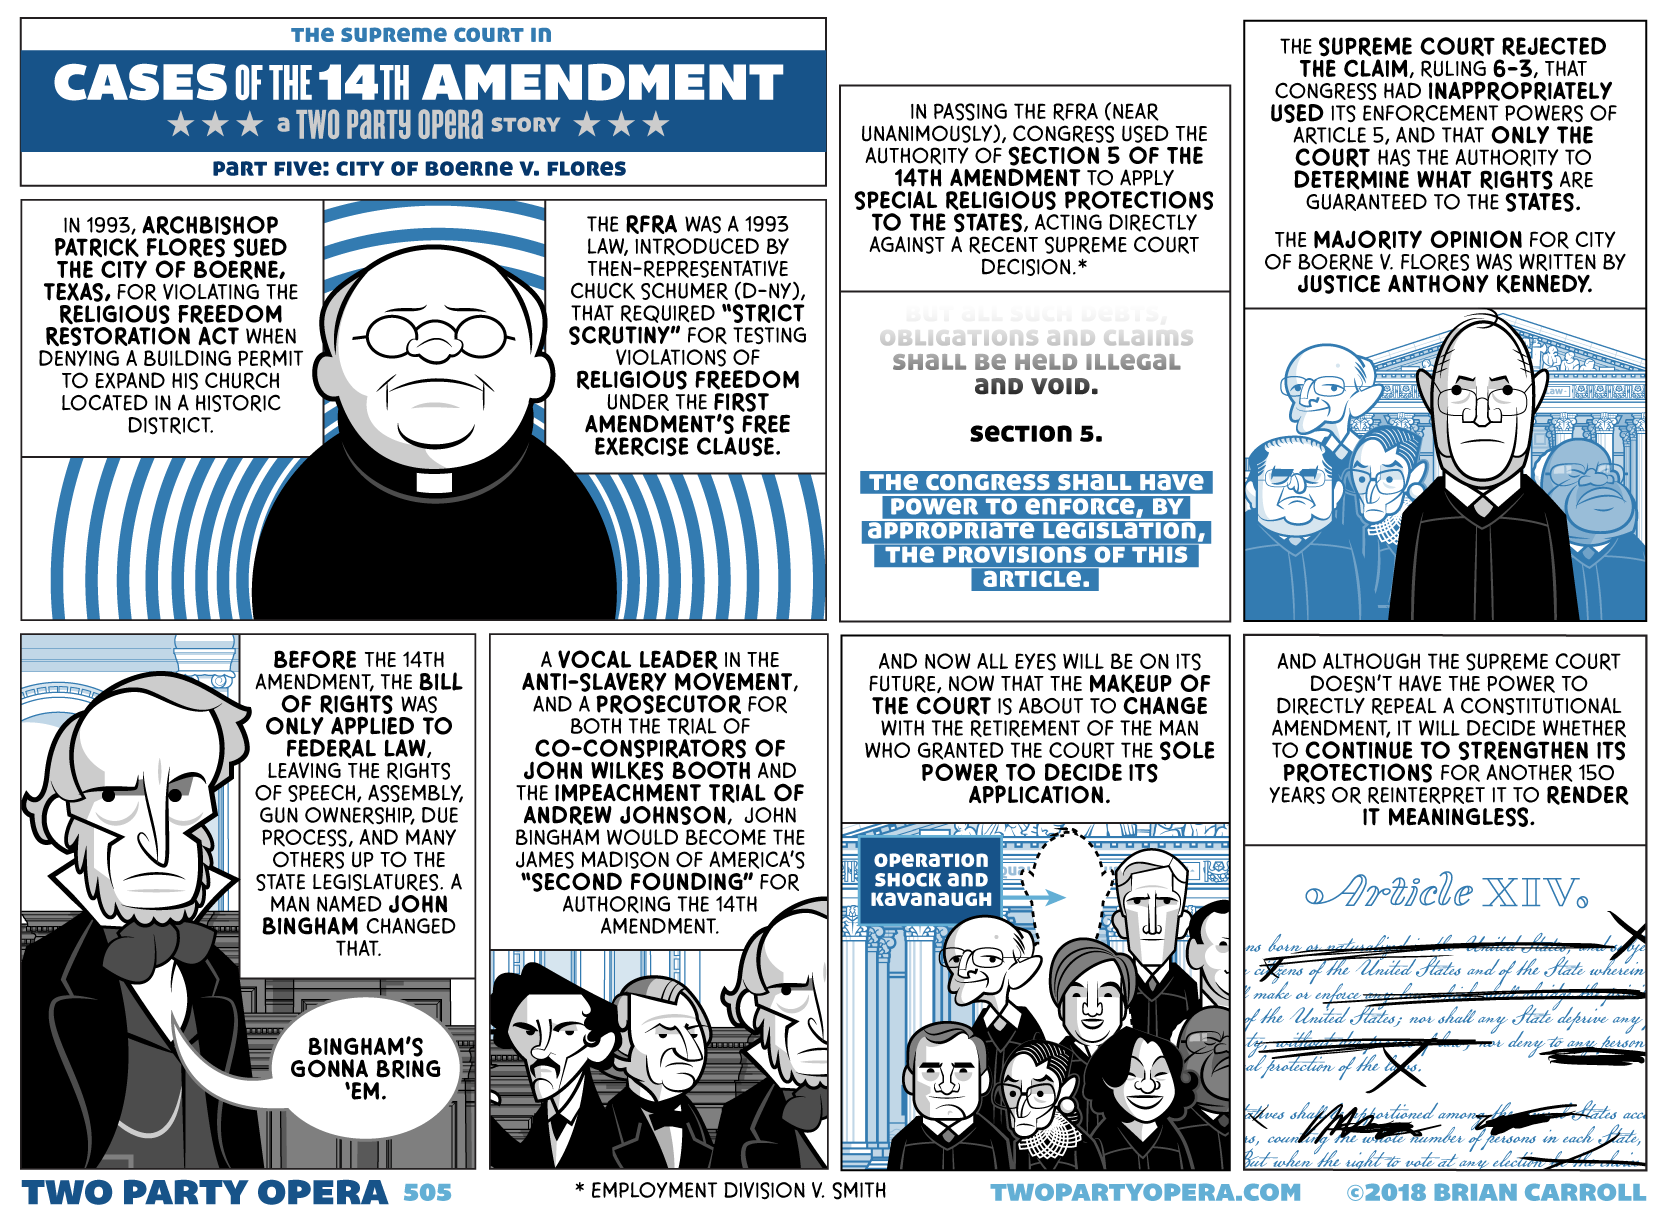 Cases of the 14th Amendment – Part Five: City of Boerne v. Flores